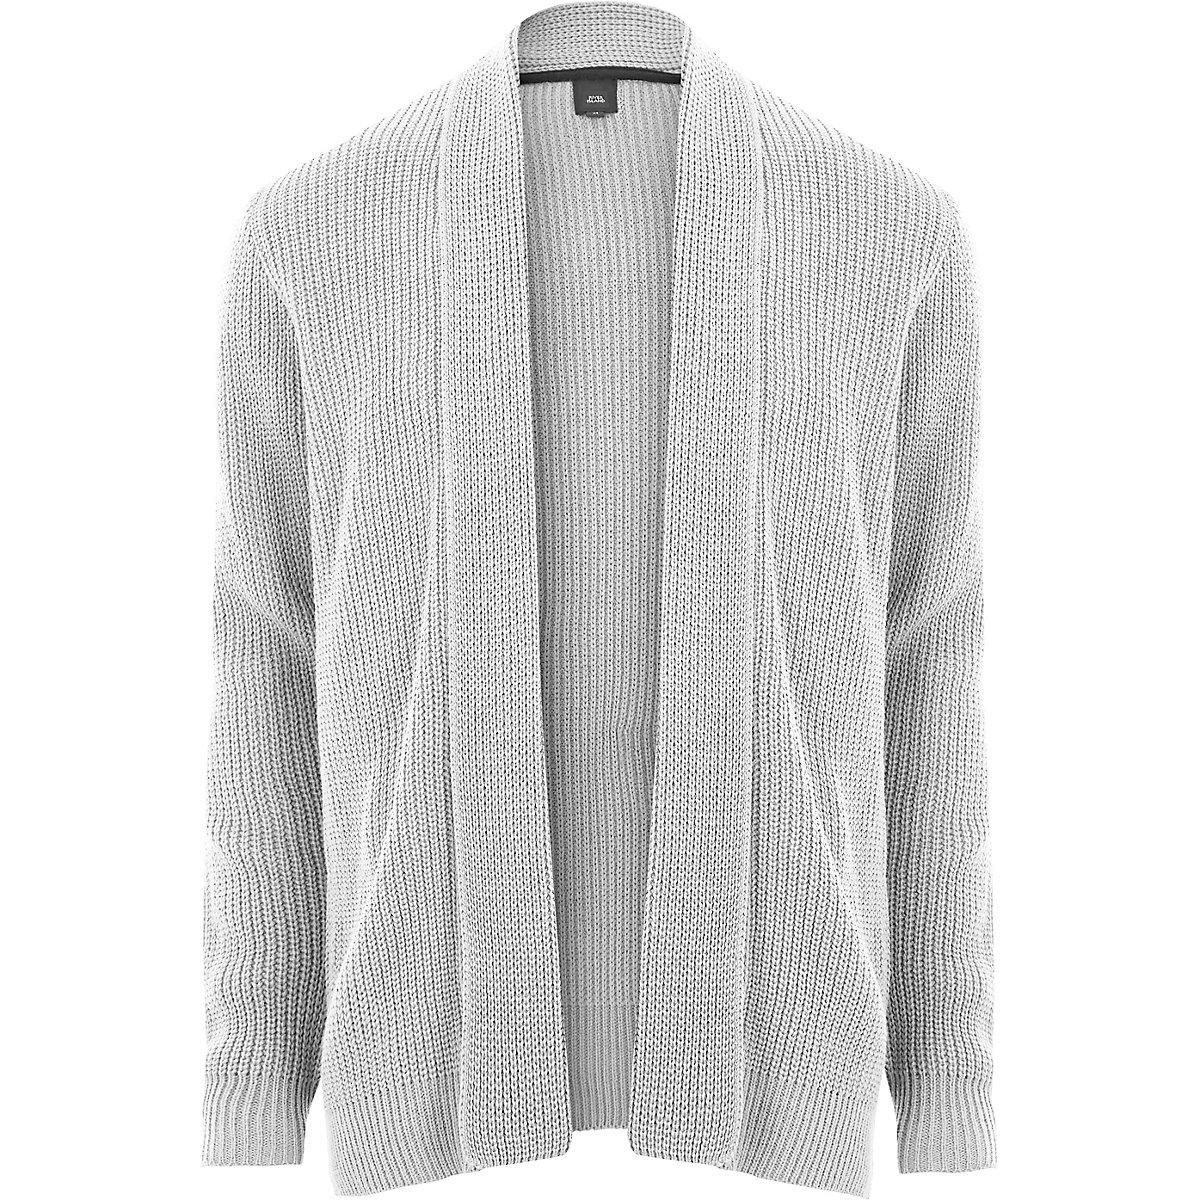 Light grey open front rib knit cardigan